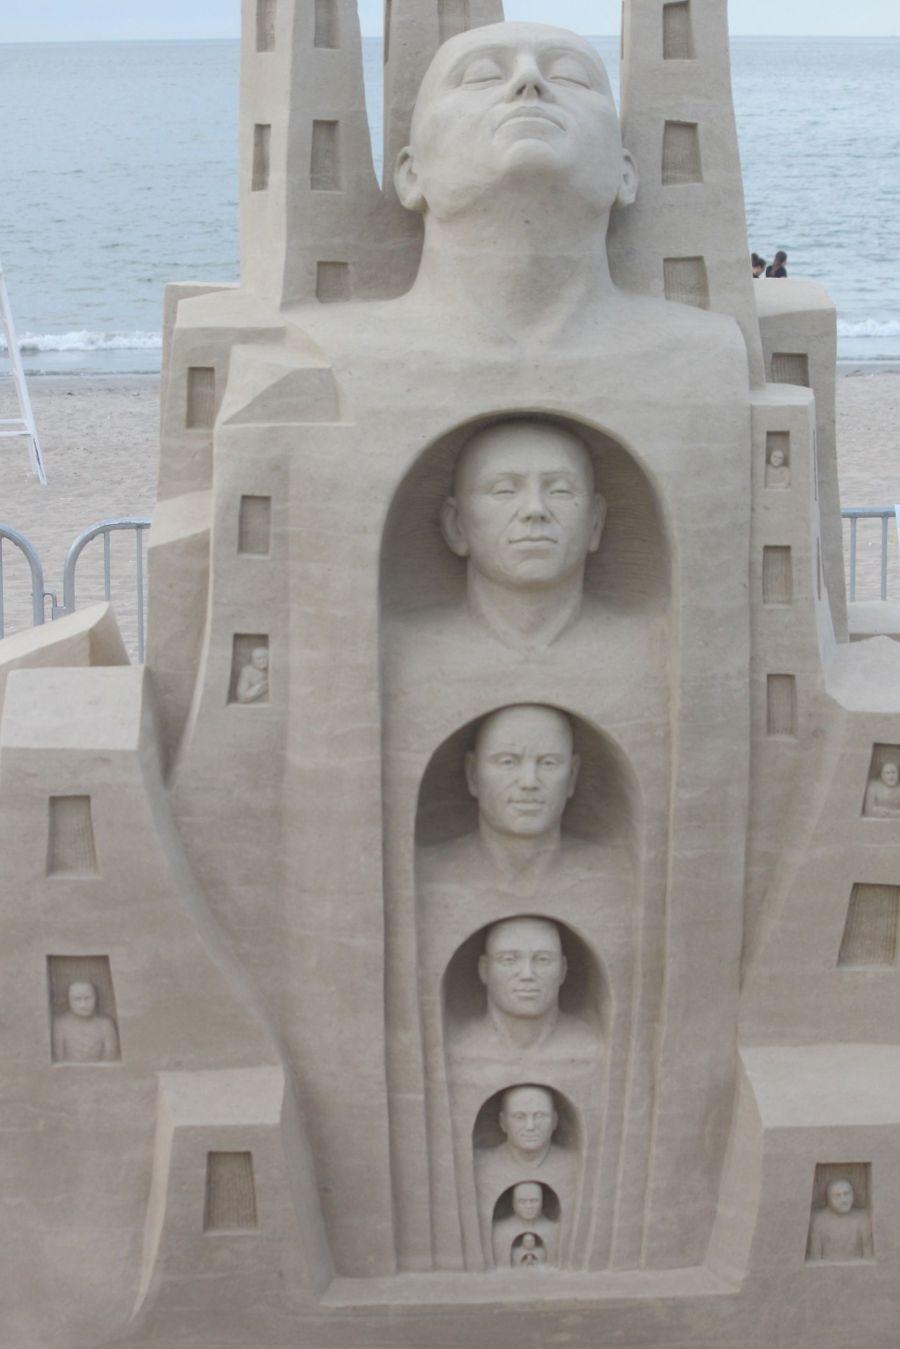 boston revere beach sand sculpture festival heads sculpture